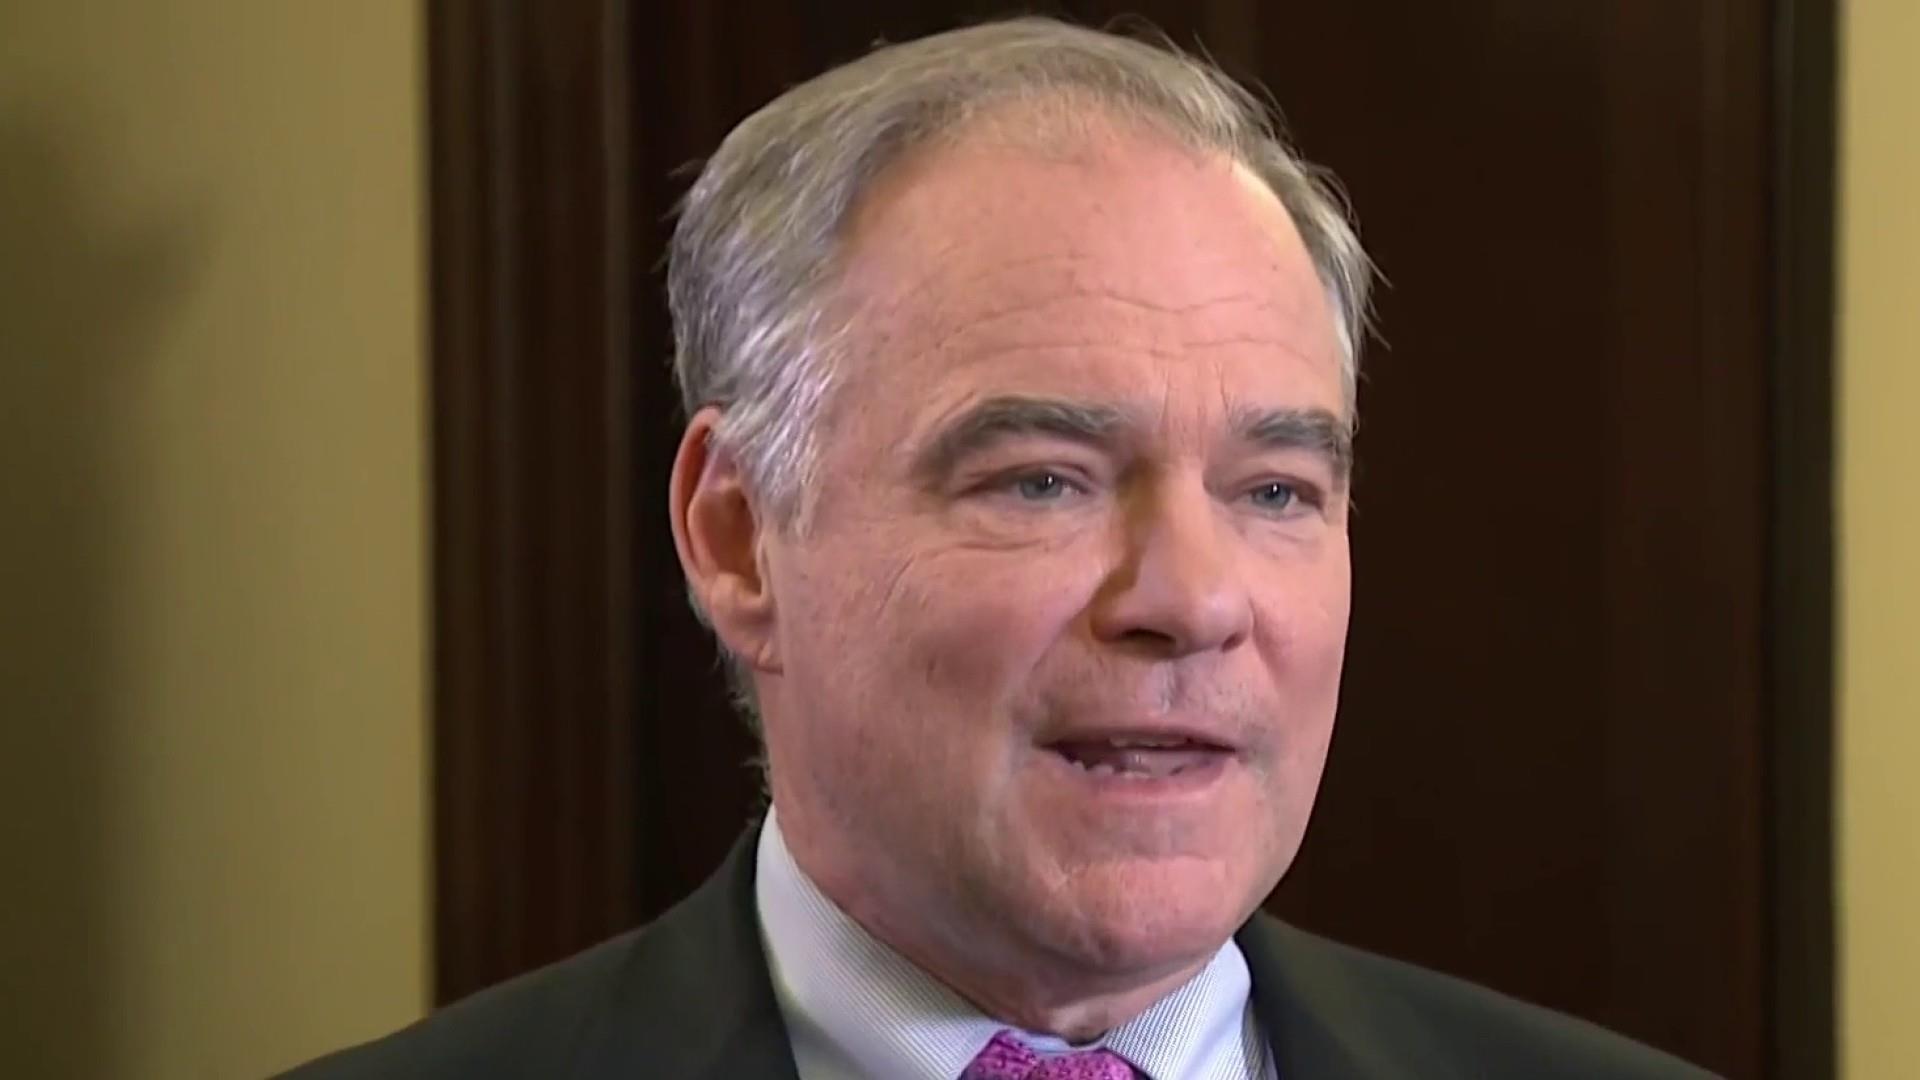 Senator Kaine slams GOP for 'enabling' Trump shutdown